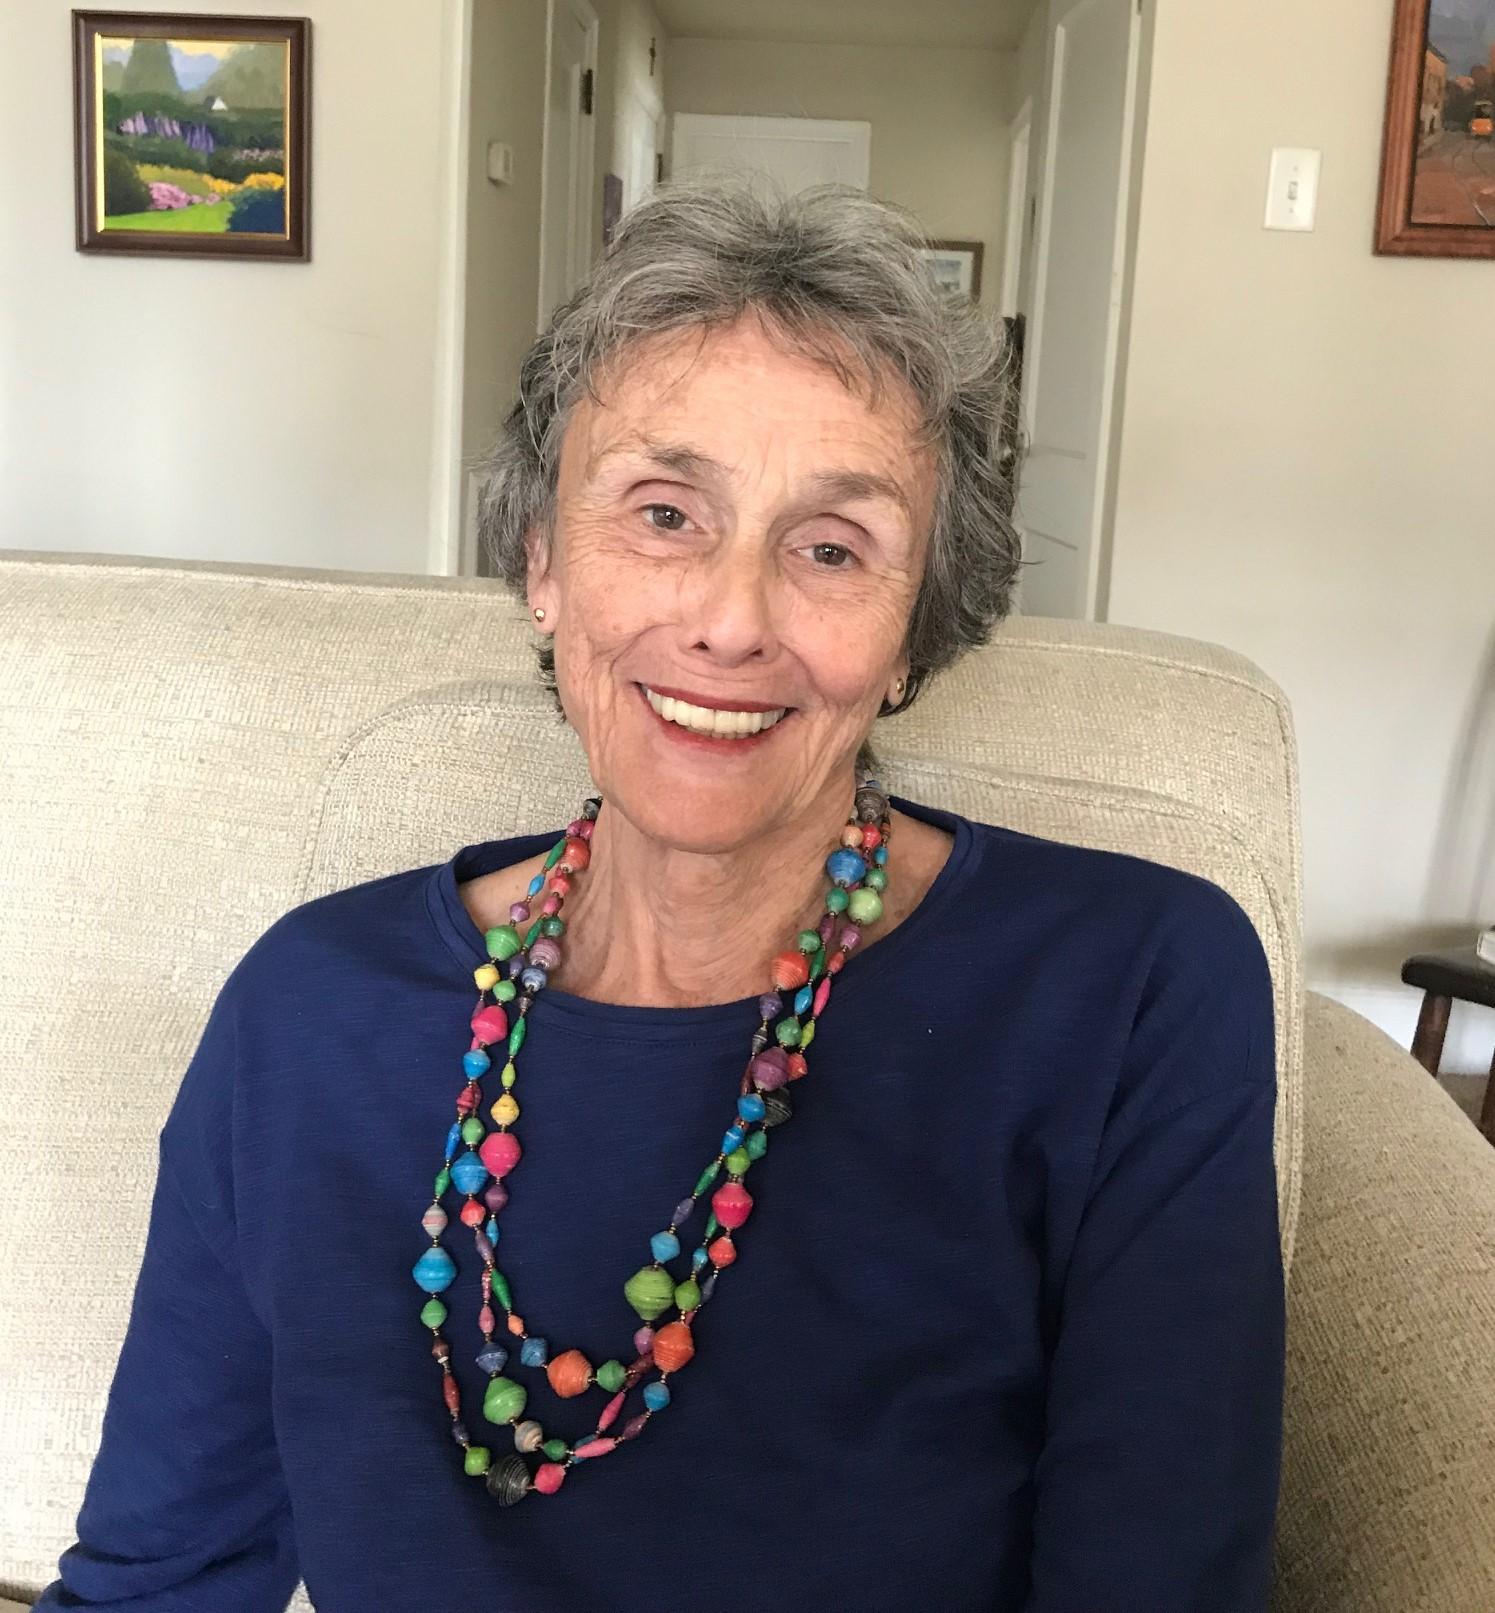 Life Board Member Anne Chappelka joined the Board in 1993.